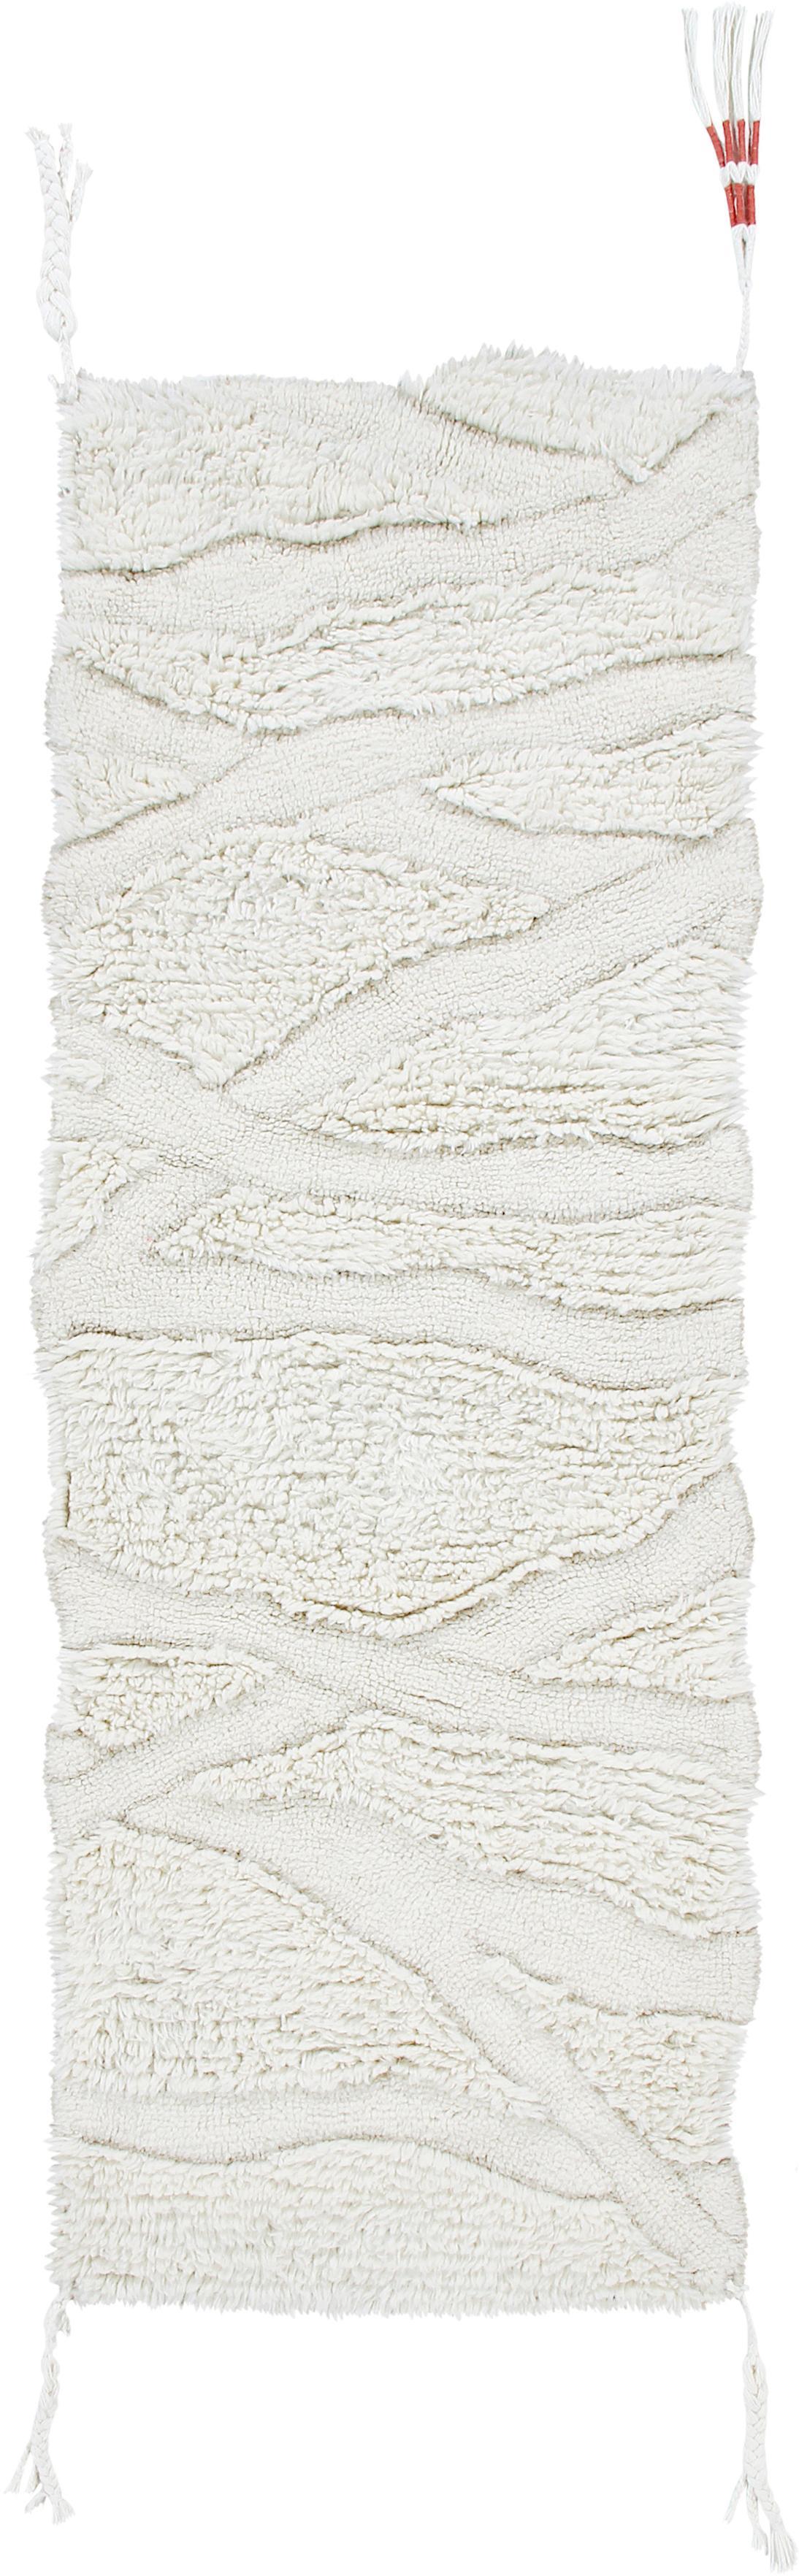 Alfombra texturizada de lana Enkang Ivory, Parte superior: 100%lana, Reverso: algodón reciclado Las alf, Blanco crudo, An 70 x L 200 cm